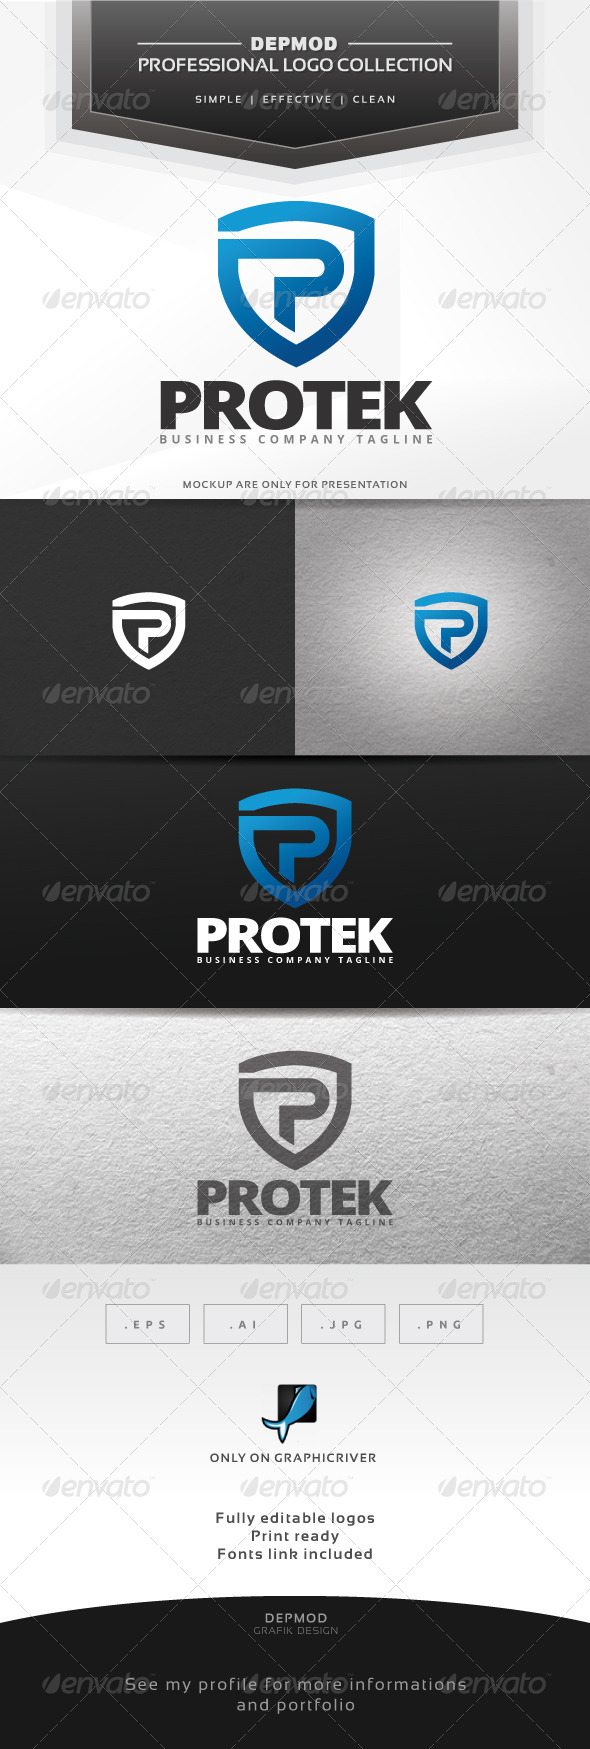 GraphicRiver Protek Logo 6939911